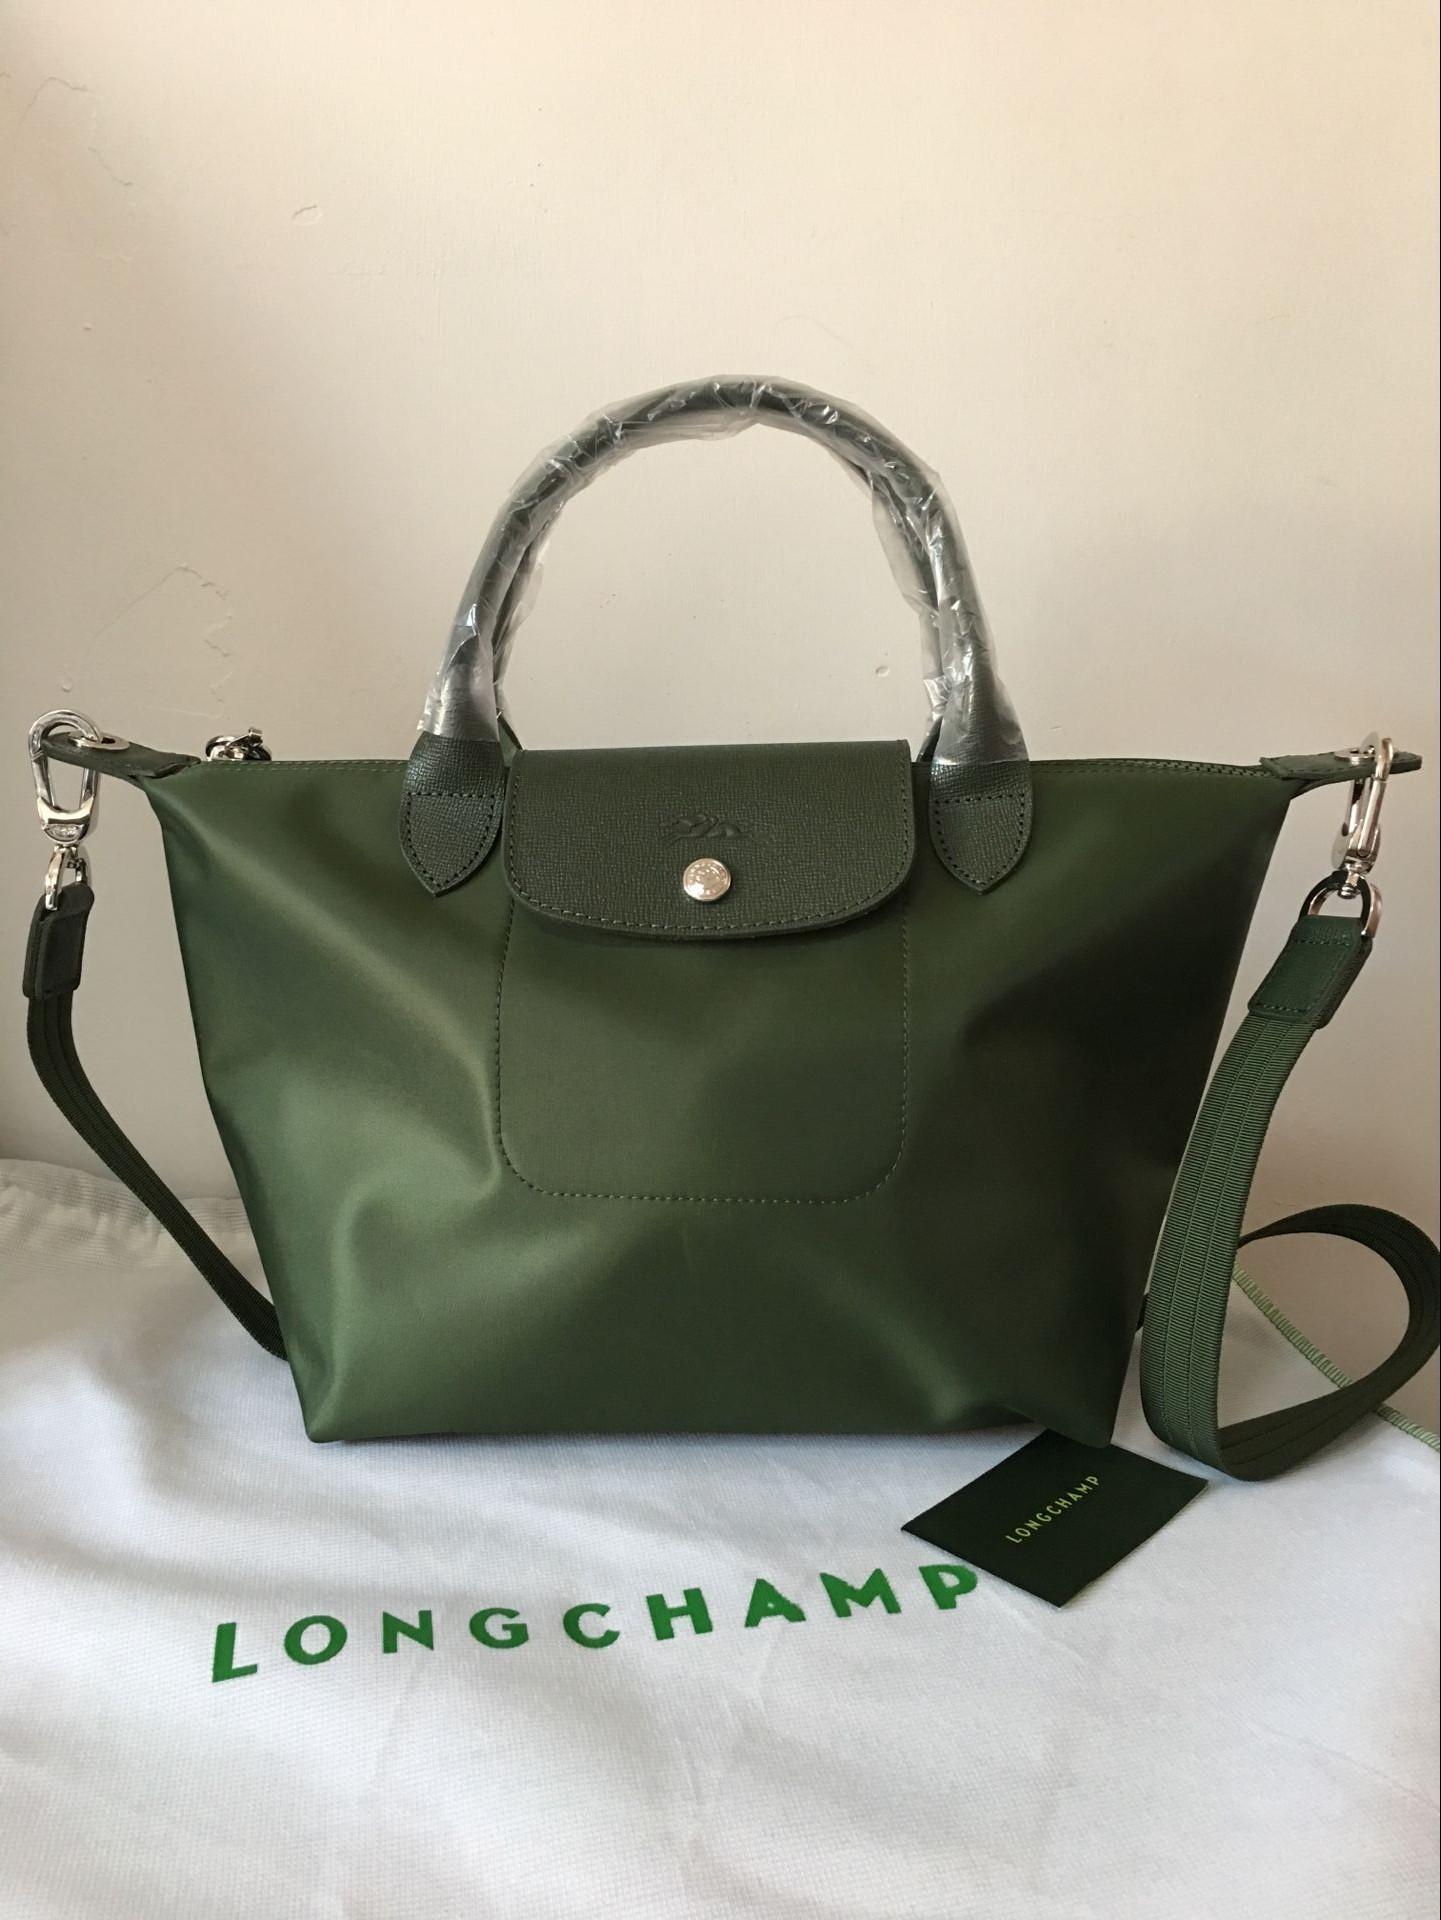 0a8c95e63ae France Made Longchamp Neo Small Handbag Moss Green 1512578749 on ...